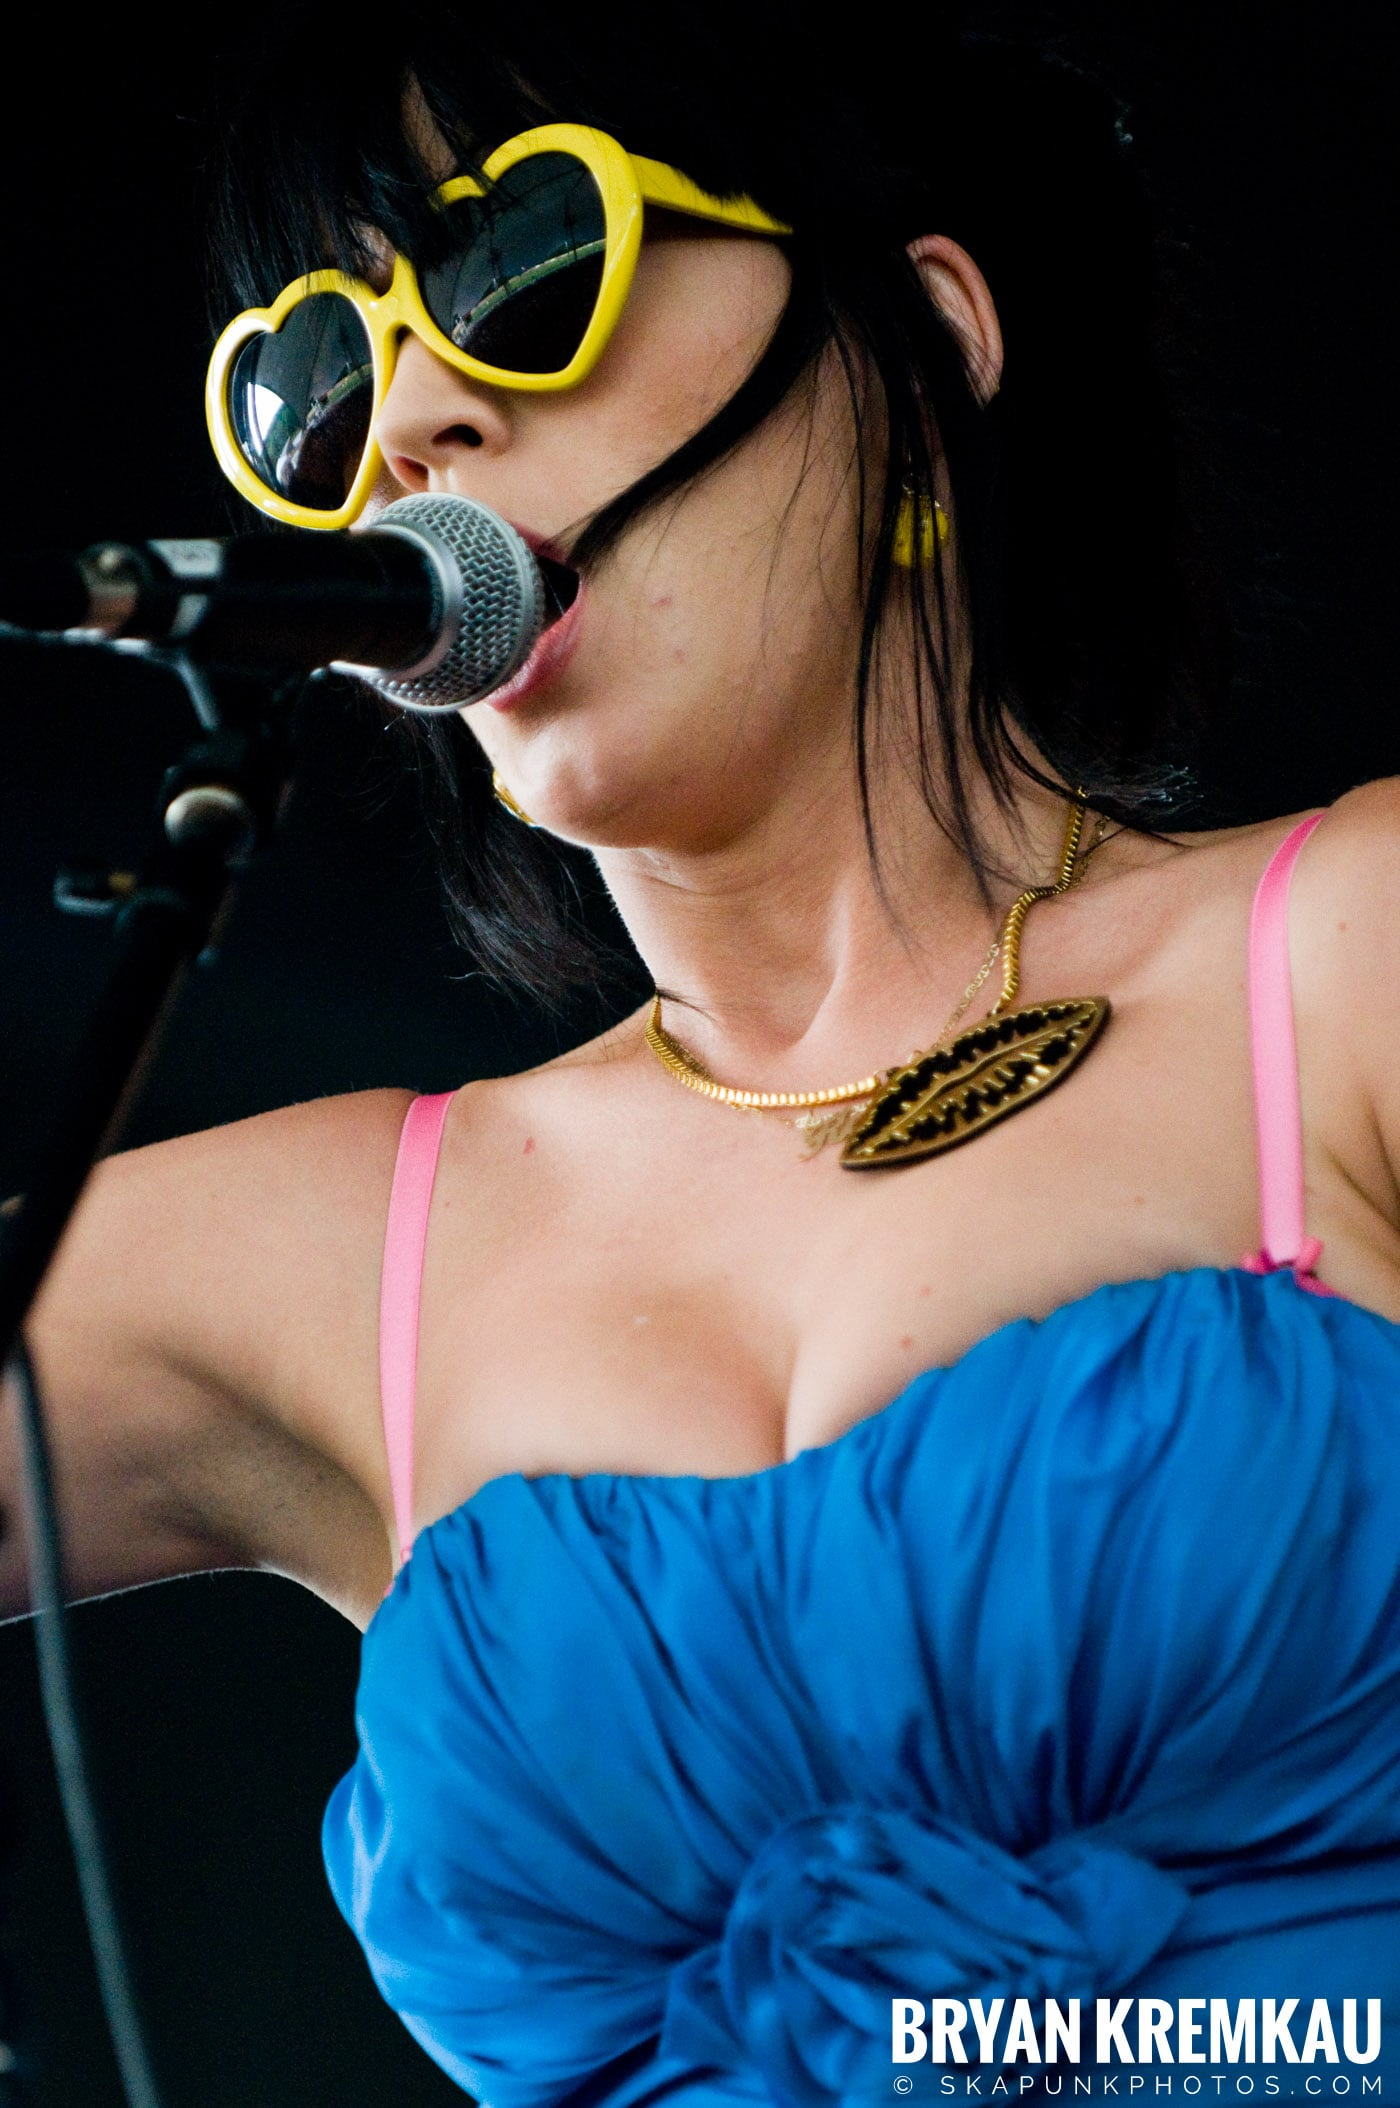 Katy Perry @ Warped Tour, Scranton PA - 7.27.08 (13)